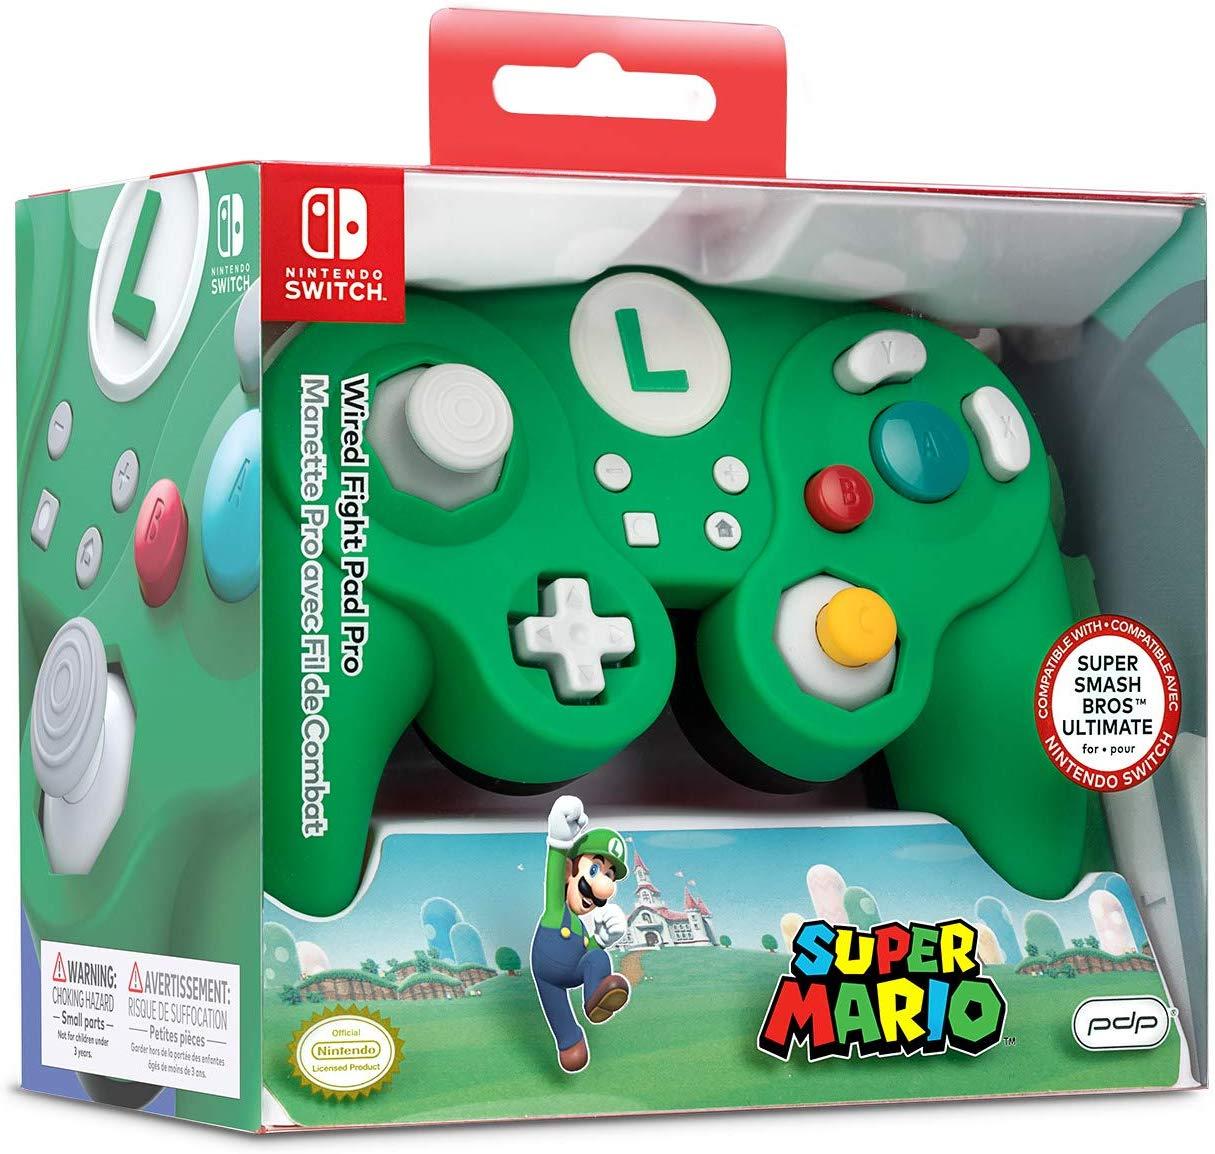 PDP Smash Fight Pad Pro Wired Controller - Luigi (Nintendo Switch) £19.97 (Prime) / £24.96 (Non Prime) @ Amazon